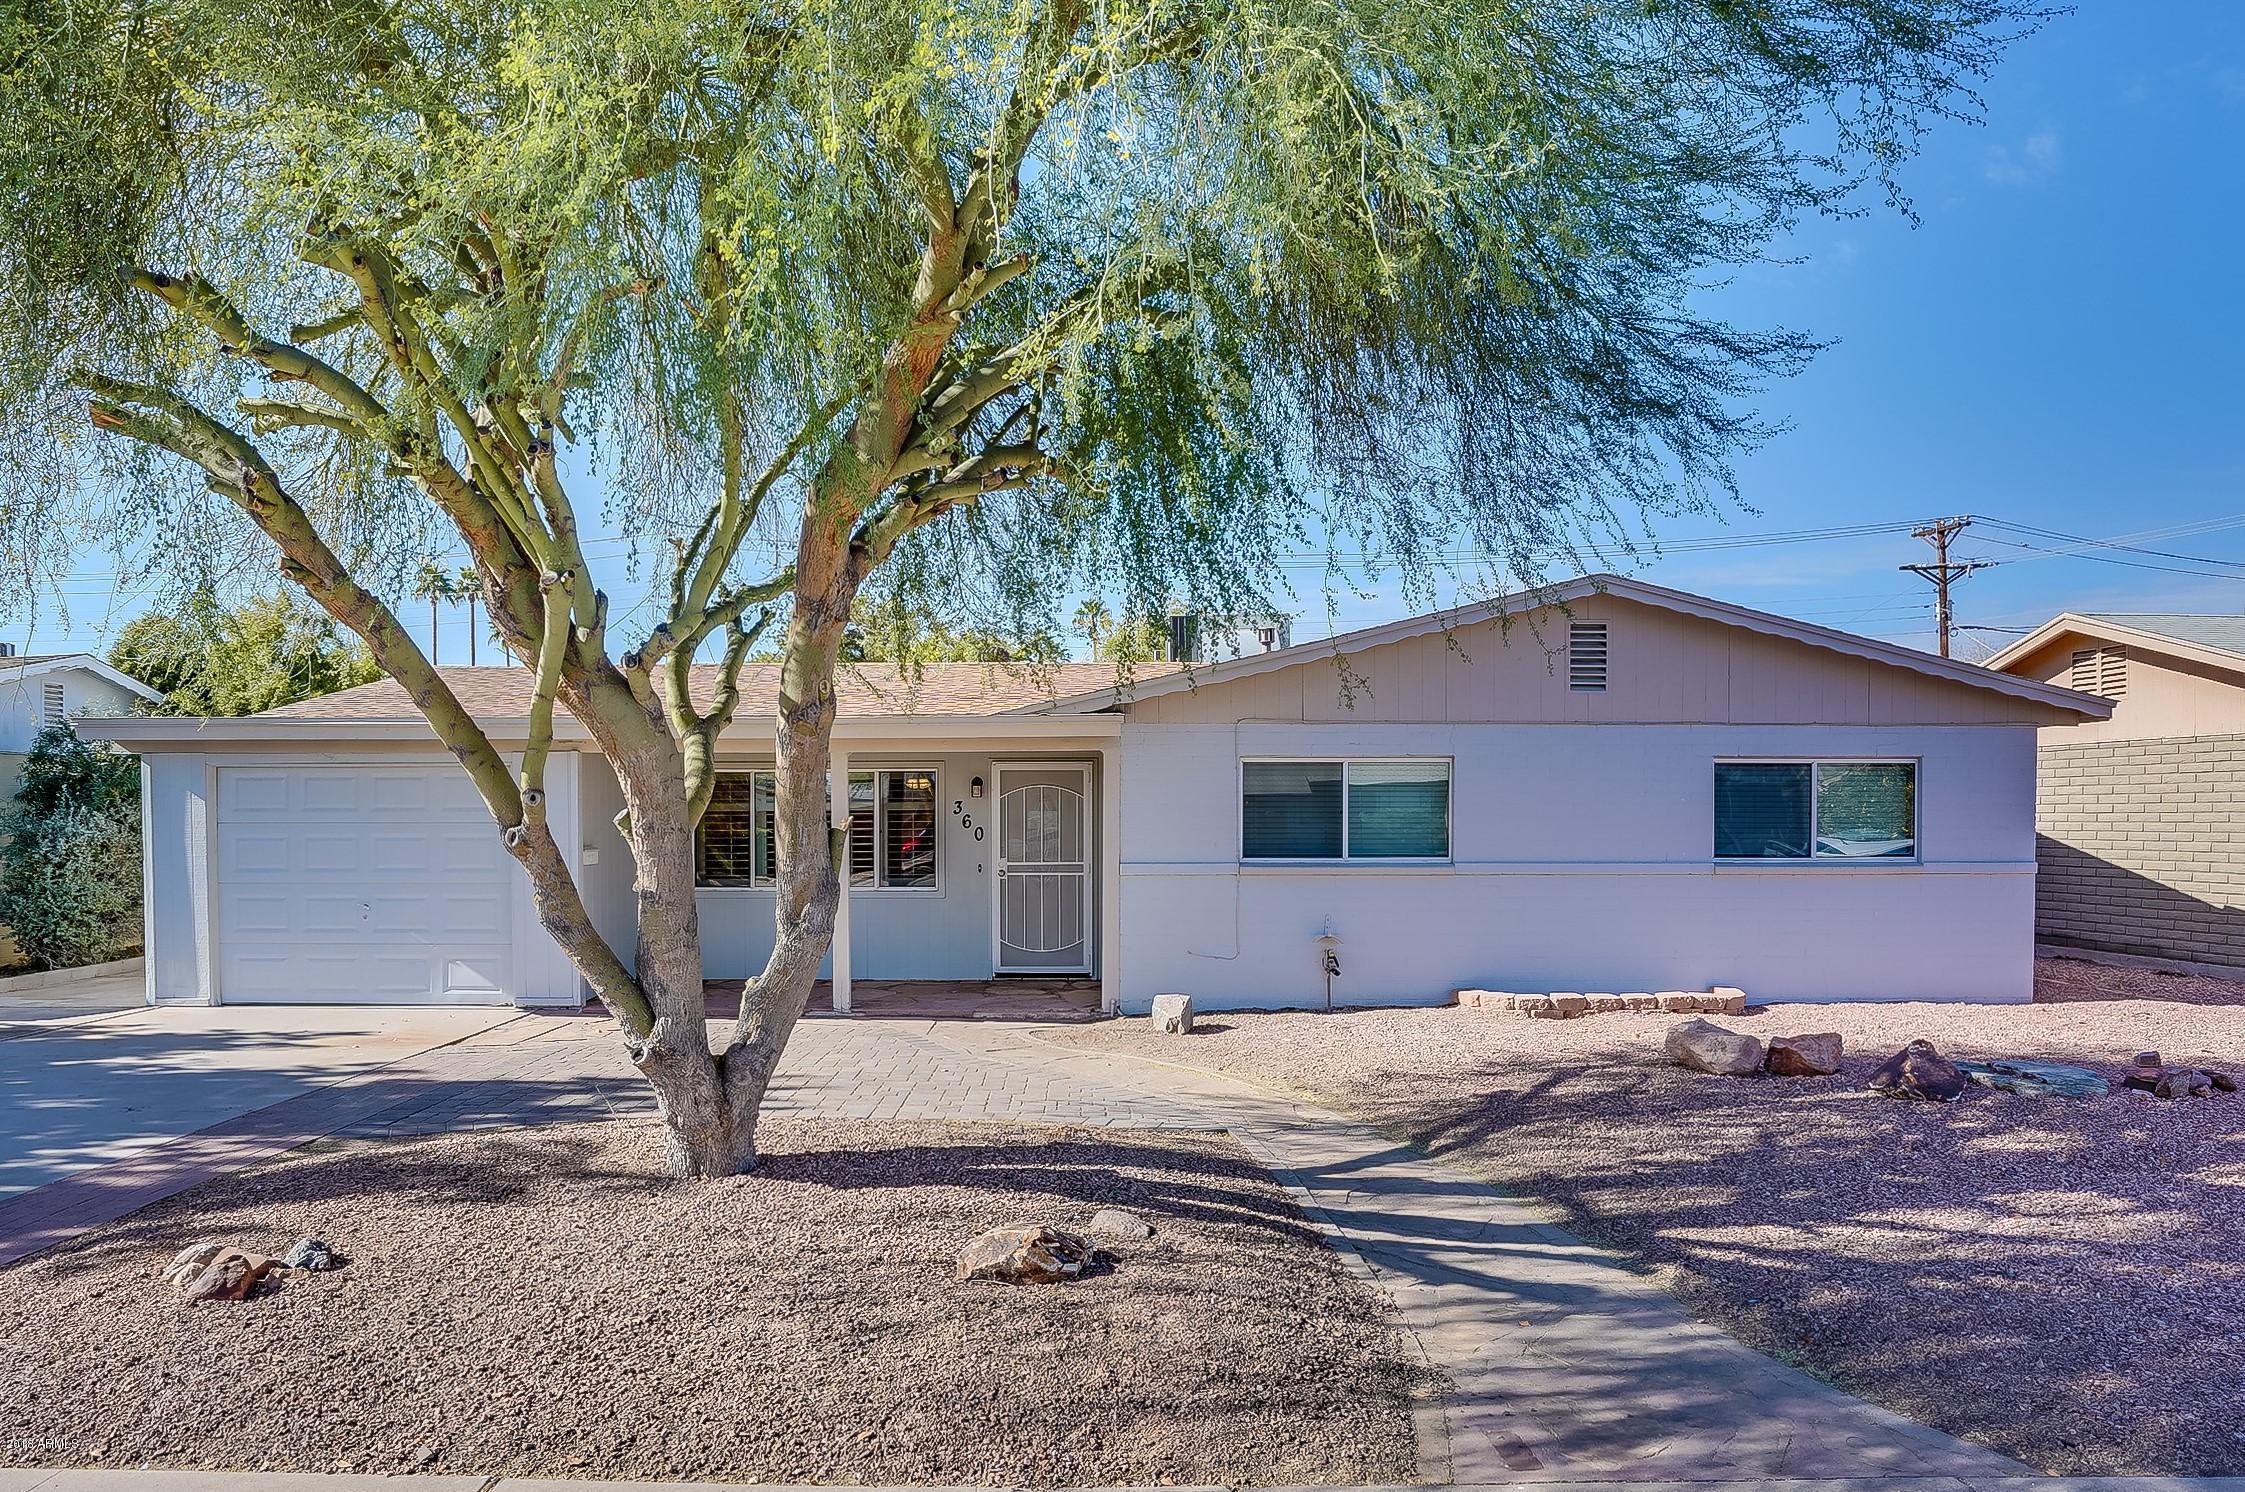 Photo of 360 N APACHE Drive, Chandler, AZ 85224